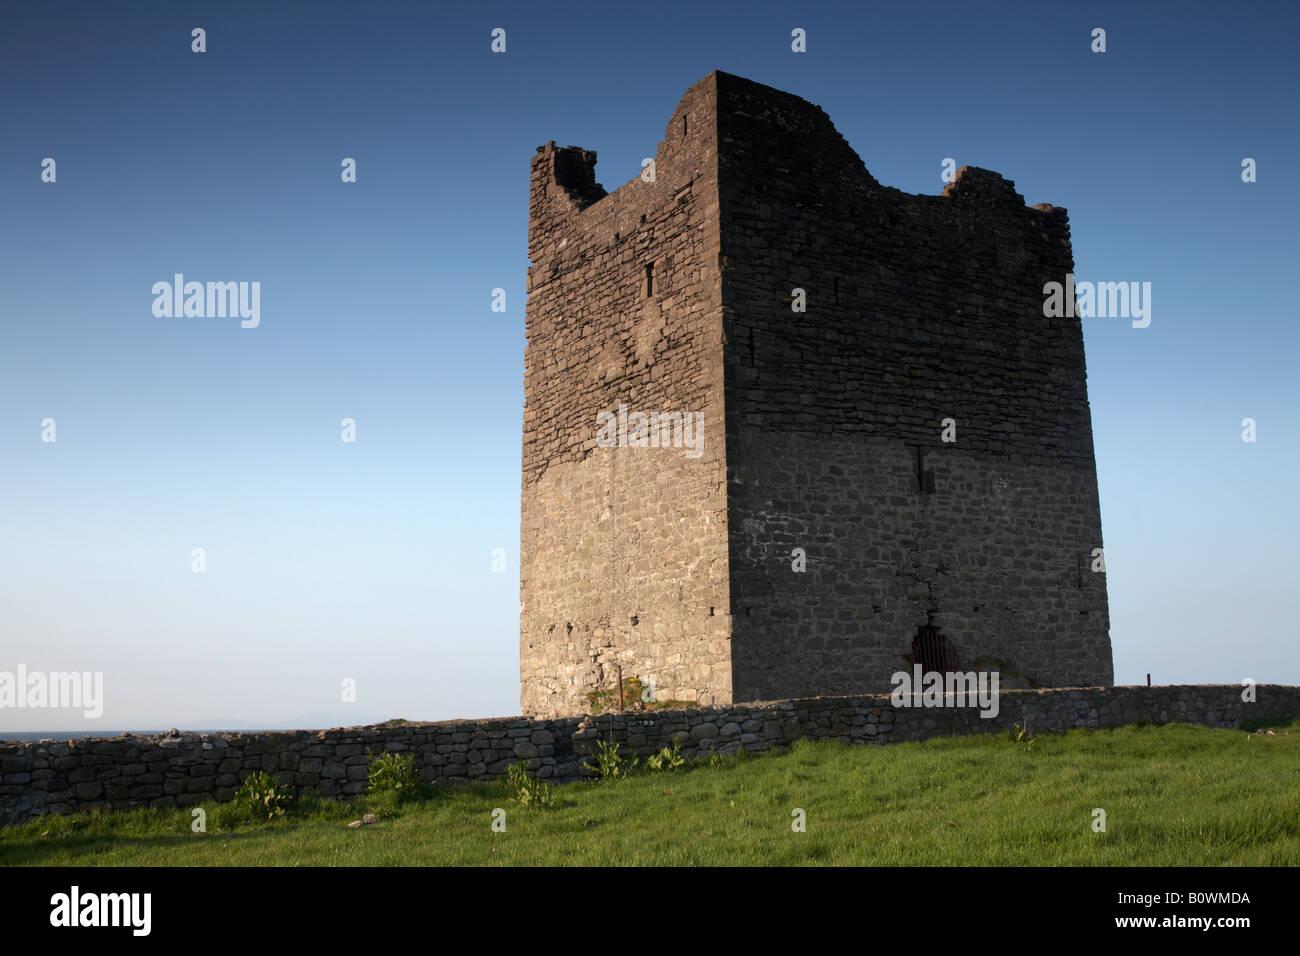 o'dowd roslea roslee castle home of the ODowd chieftains built in 1207 easkey county sligo republic of ireland Stock Photo